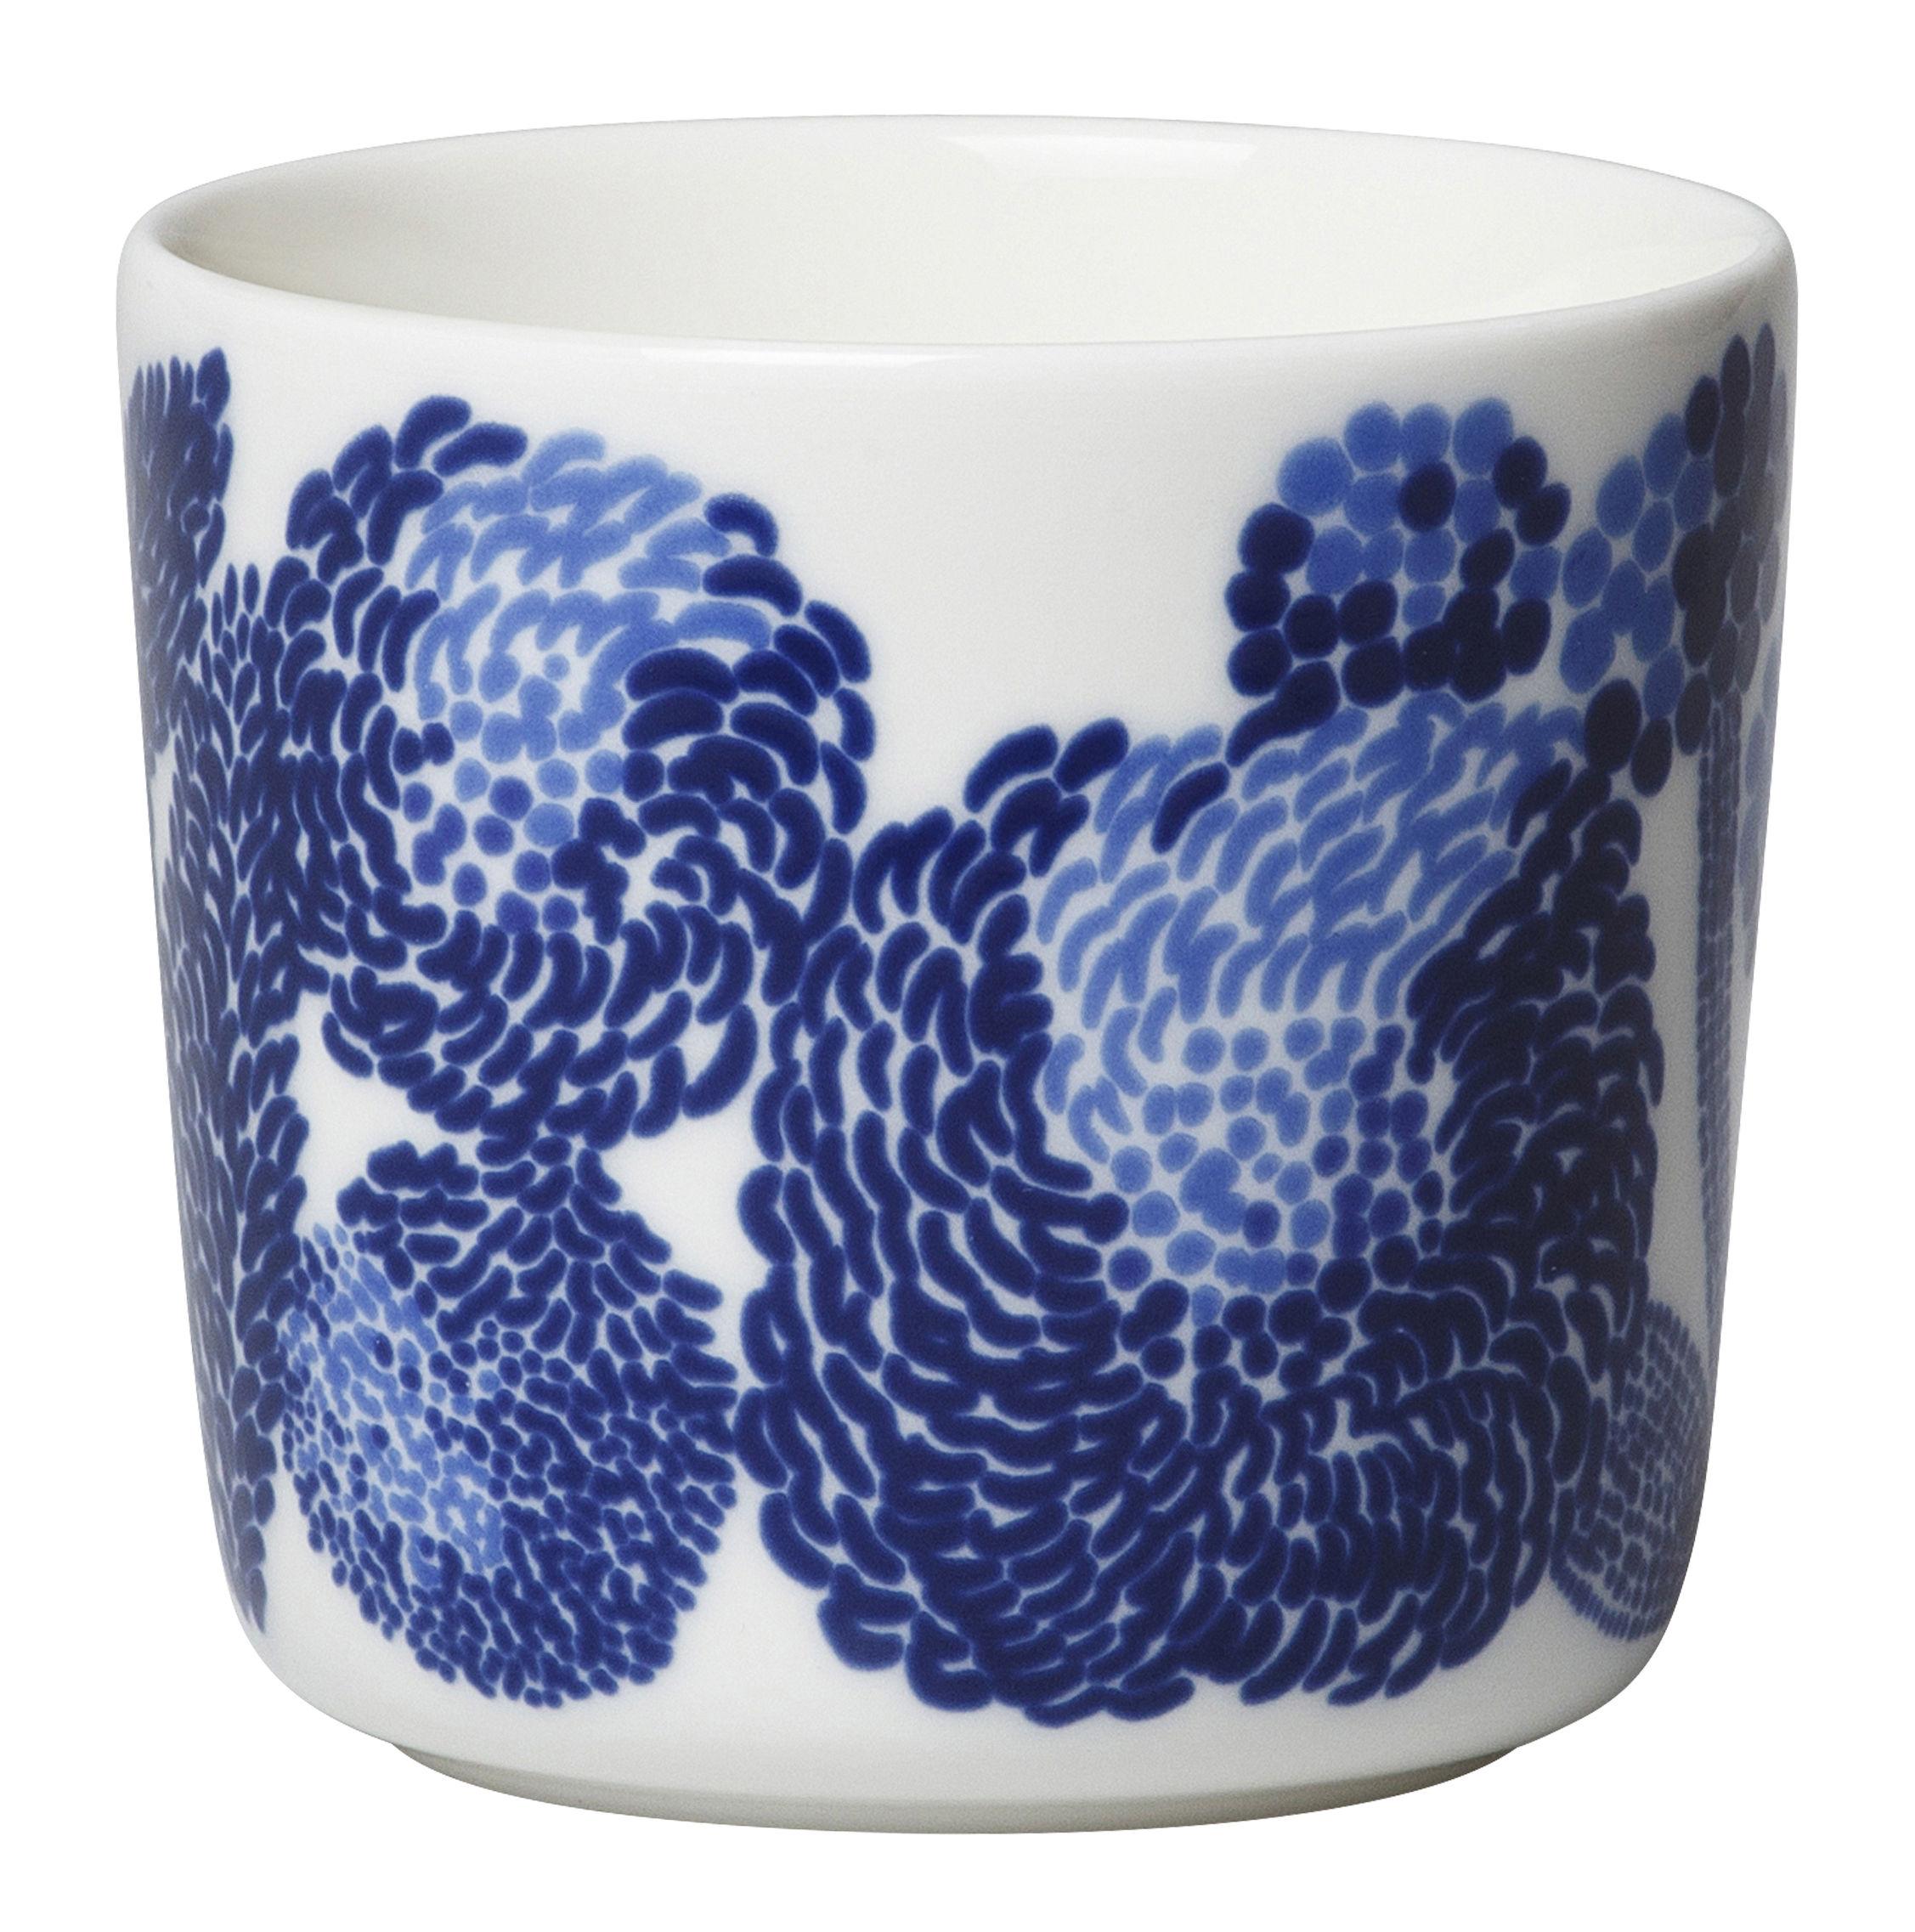 Tableware - Coffee Mugs & Tea Cups - Oiva Mynsteri Coffee cup - / Sans anse by Marimekko - Mynsteri / Blanc & bleu - Sandstone